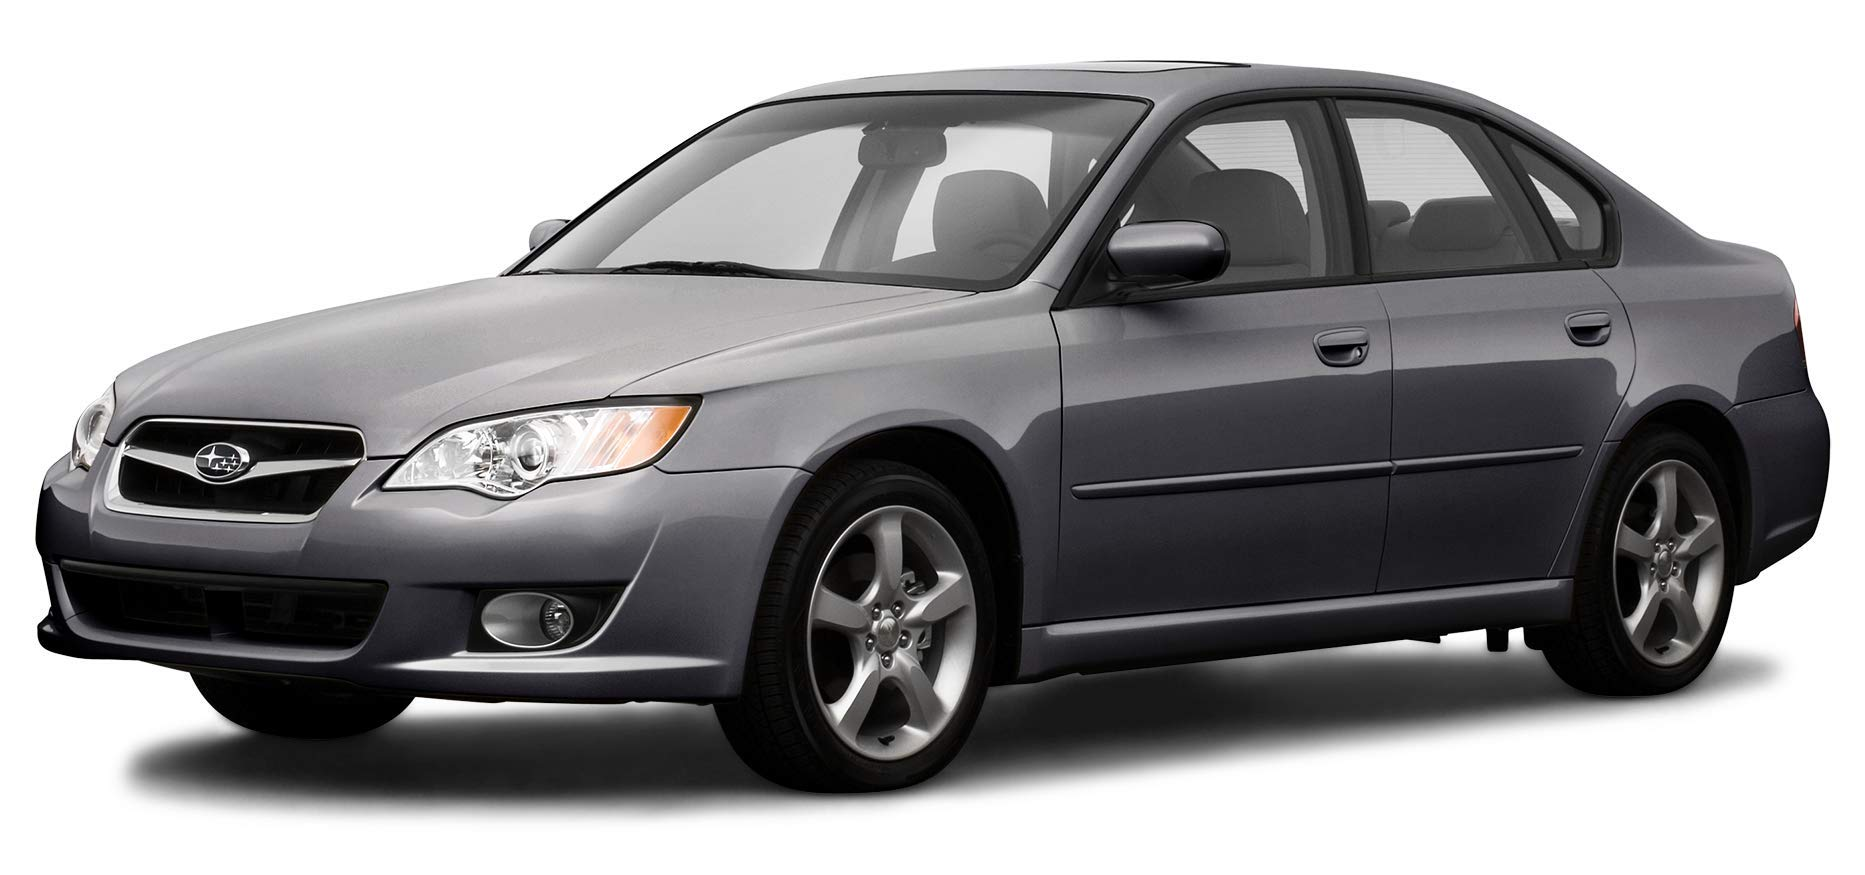 Fits 2009 2010 Pontiac Vibe Base 1.8L L4 GAS DOHC FWD